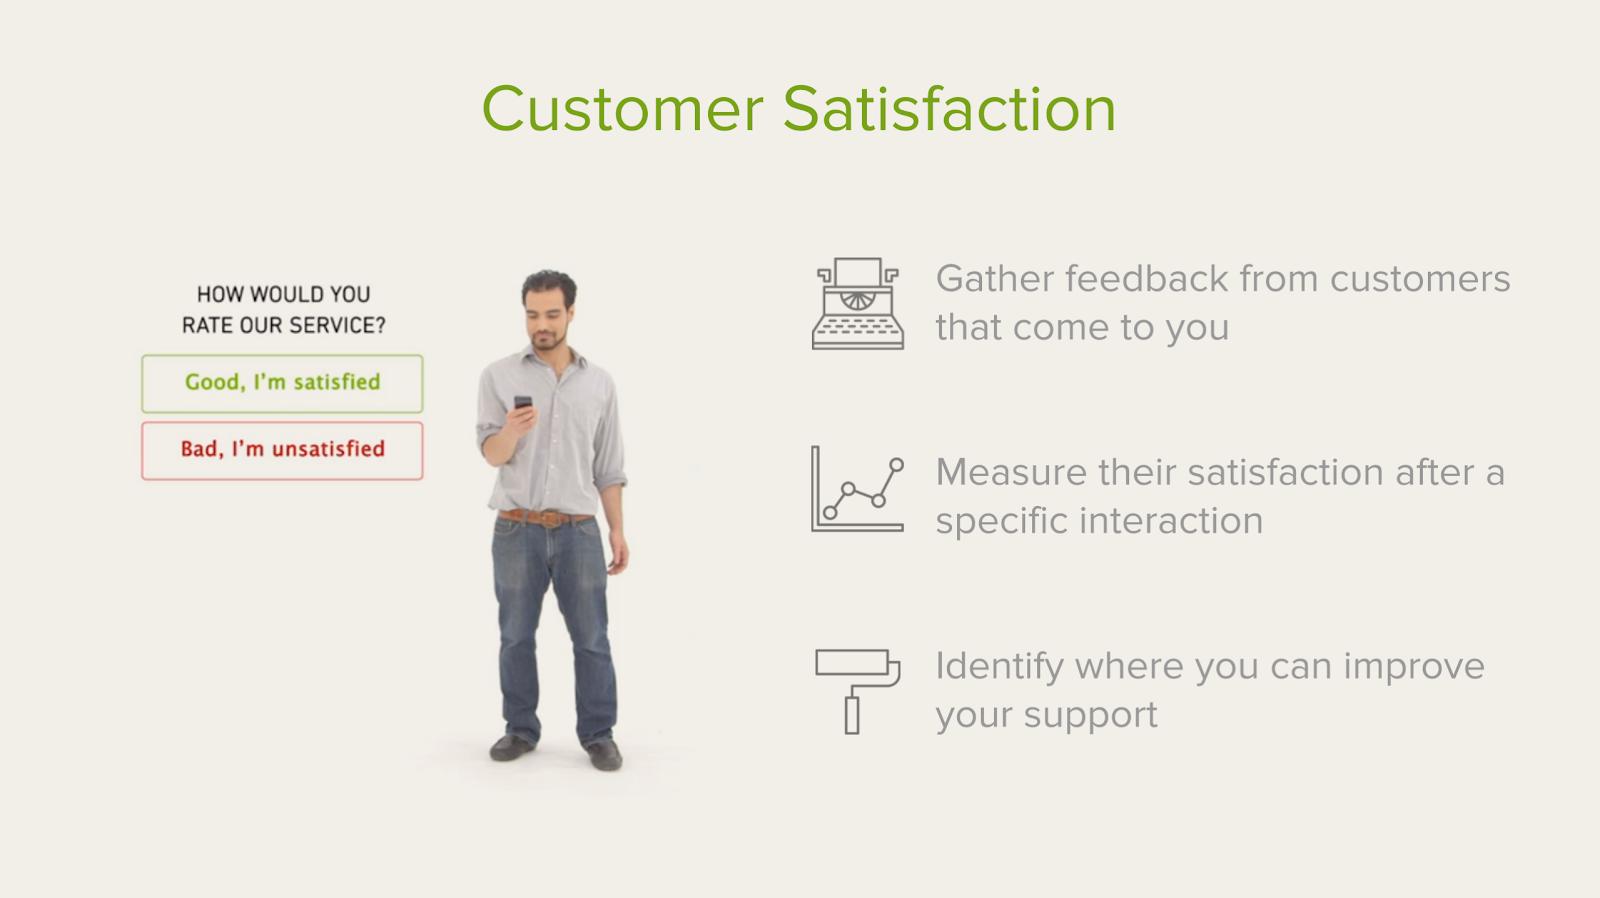 CSAT measures customer satisfaction.